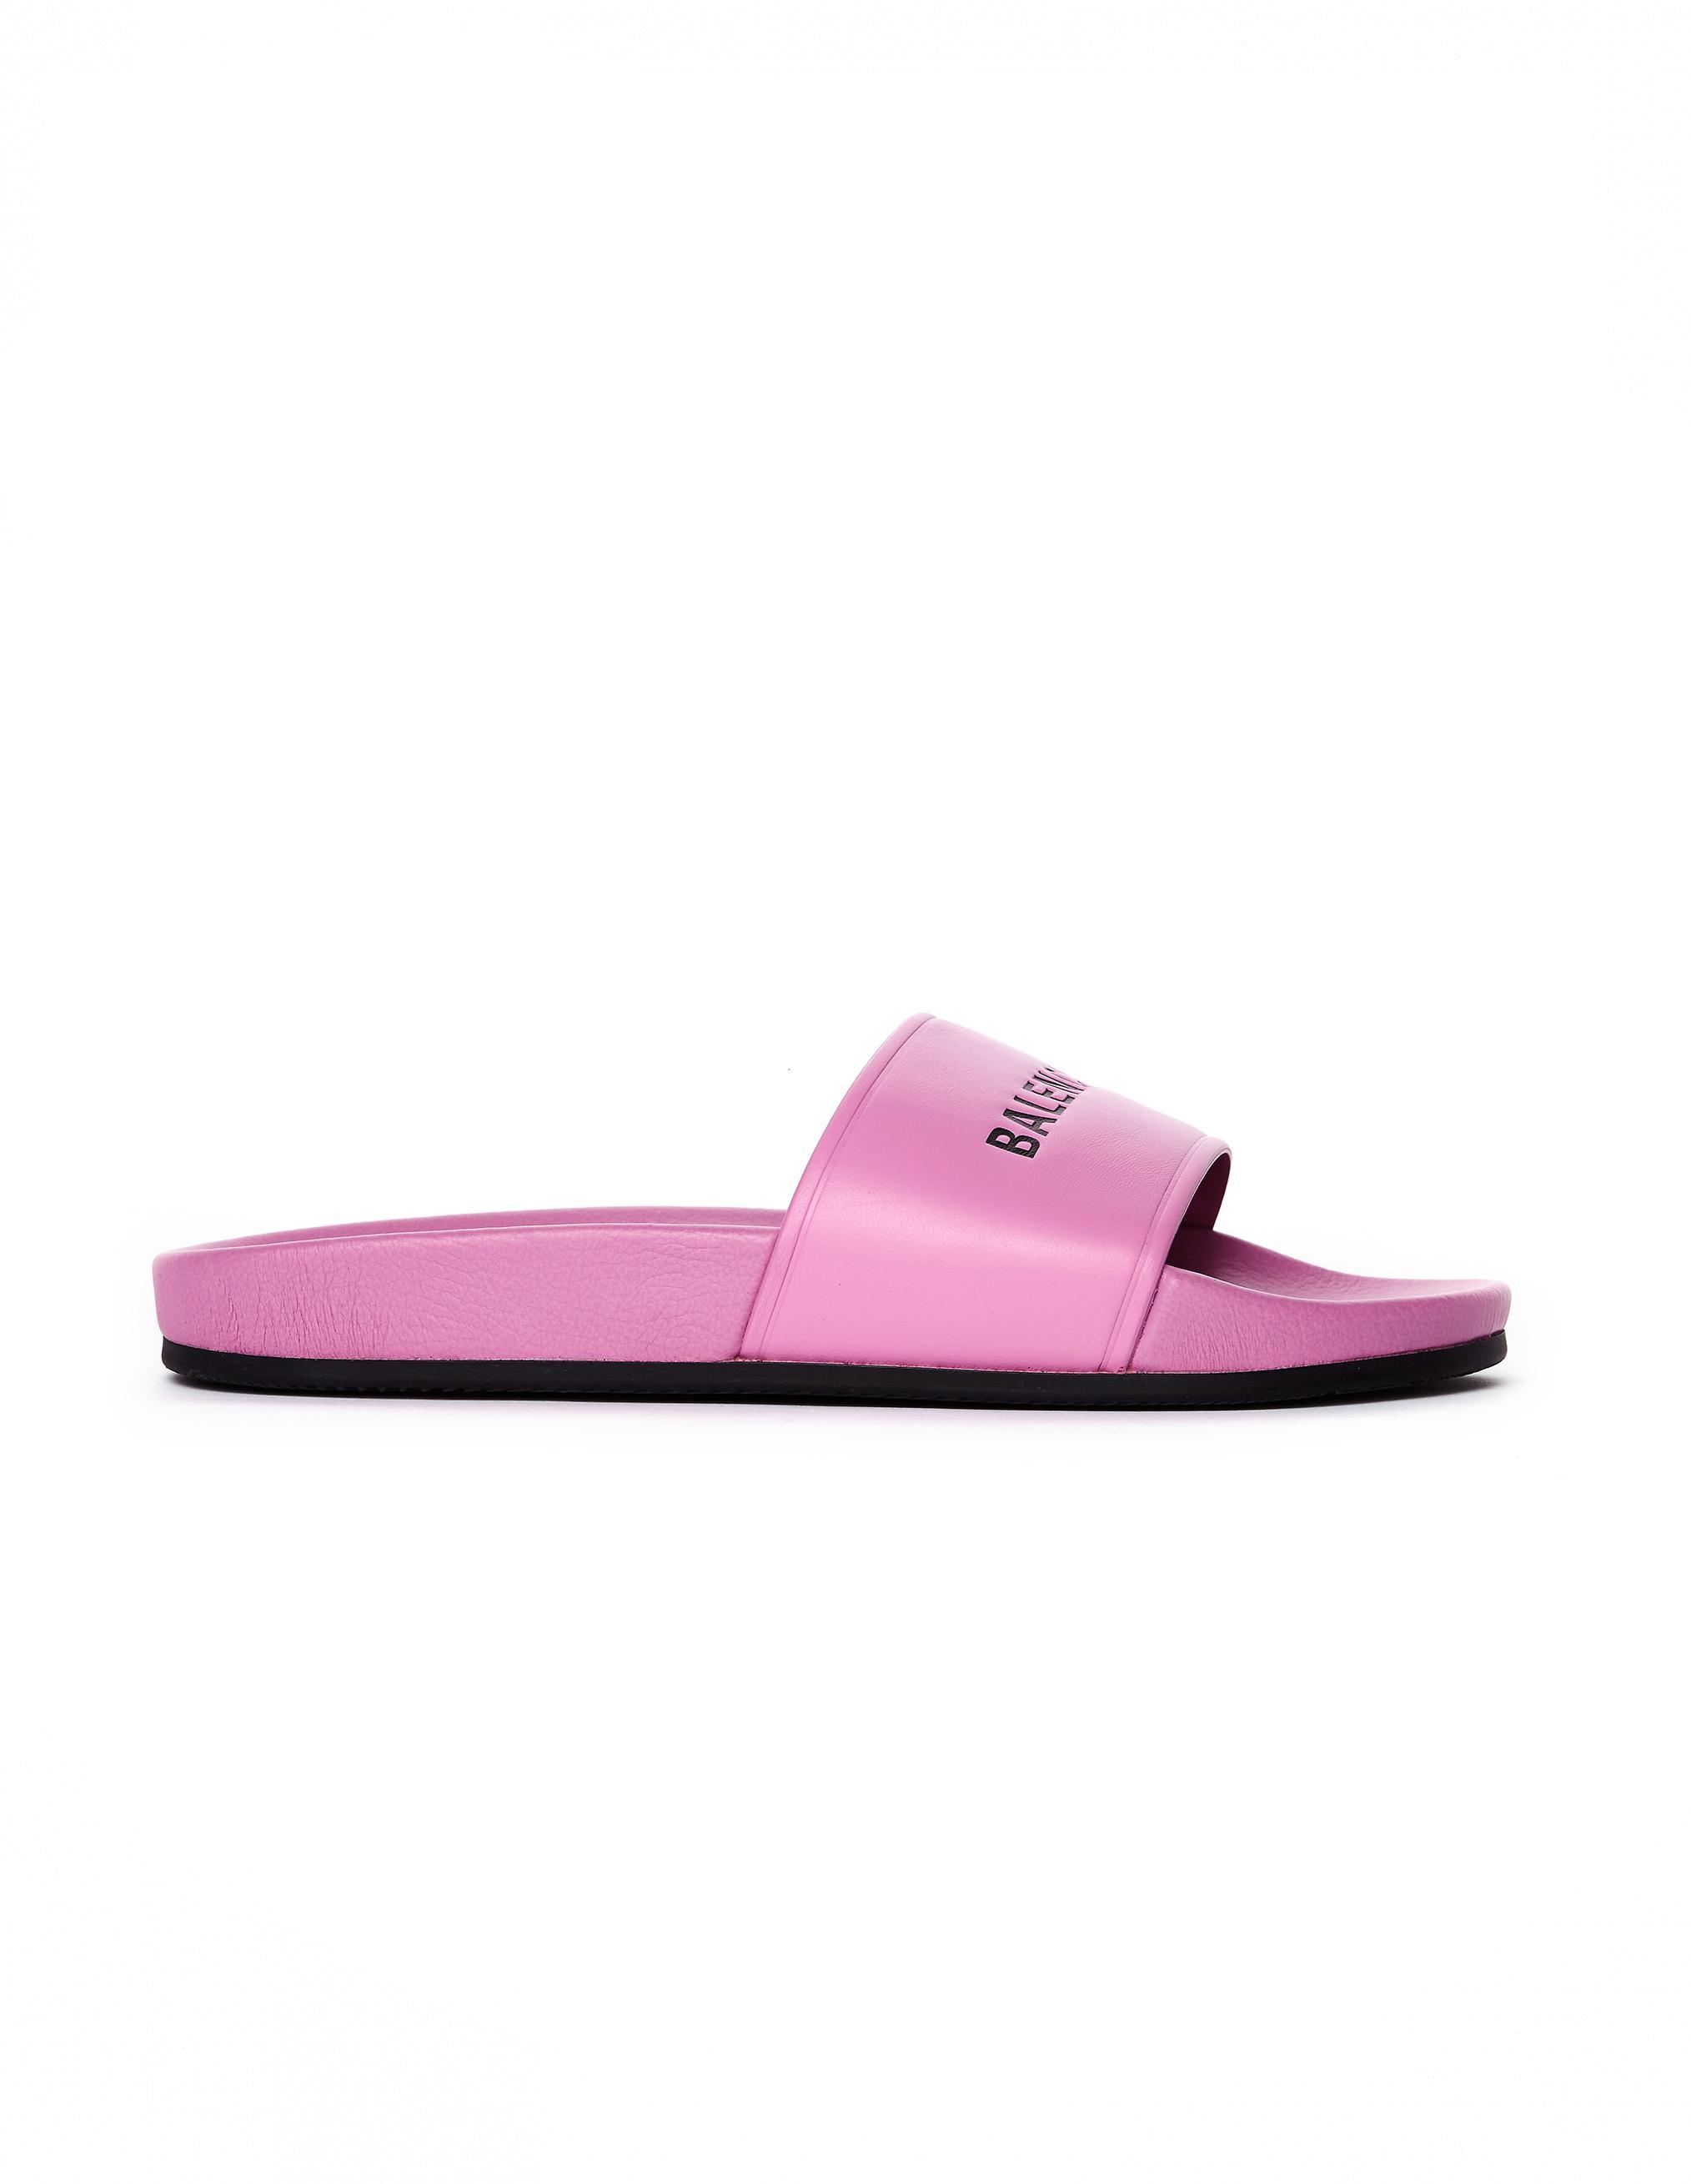 50f89f9e294 Balenciaga Pink Logo Slides in Pink - Lyst